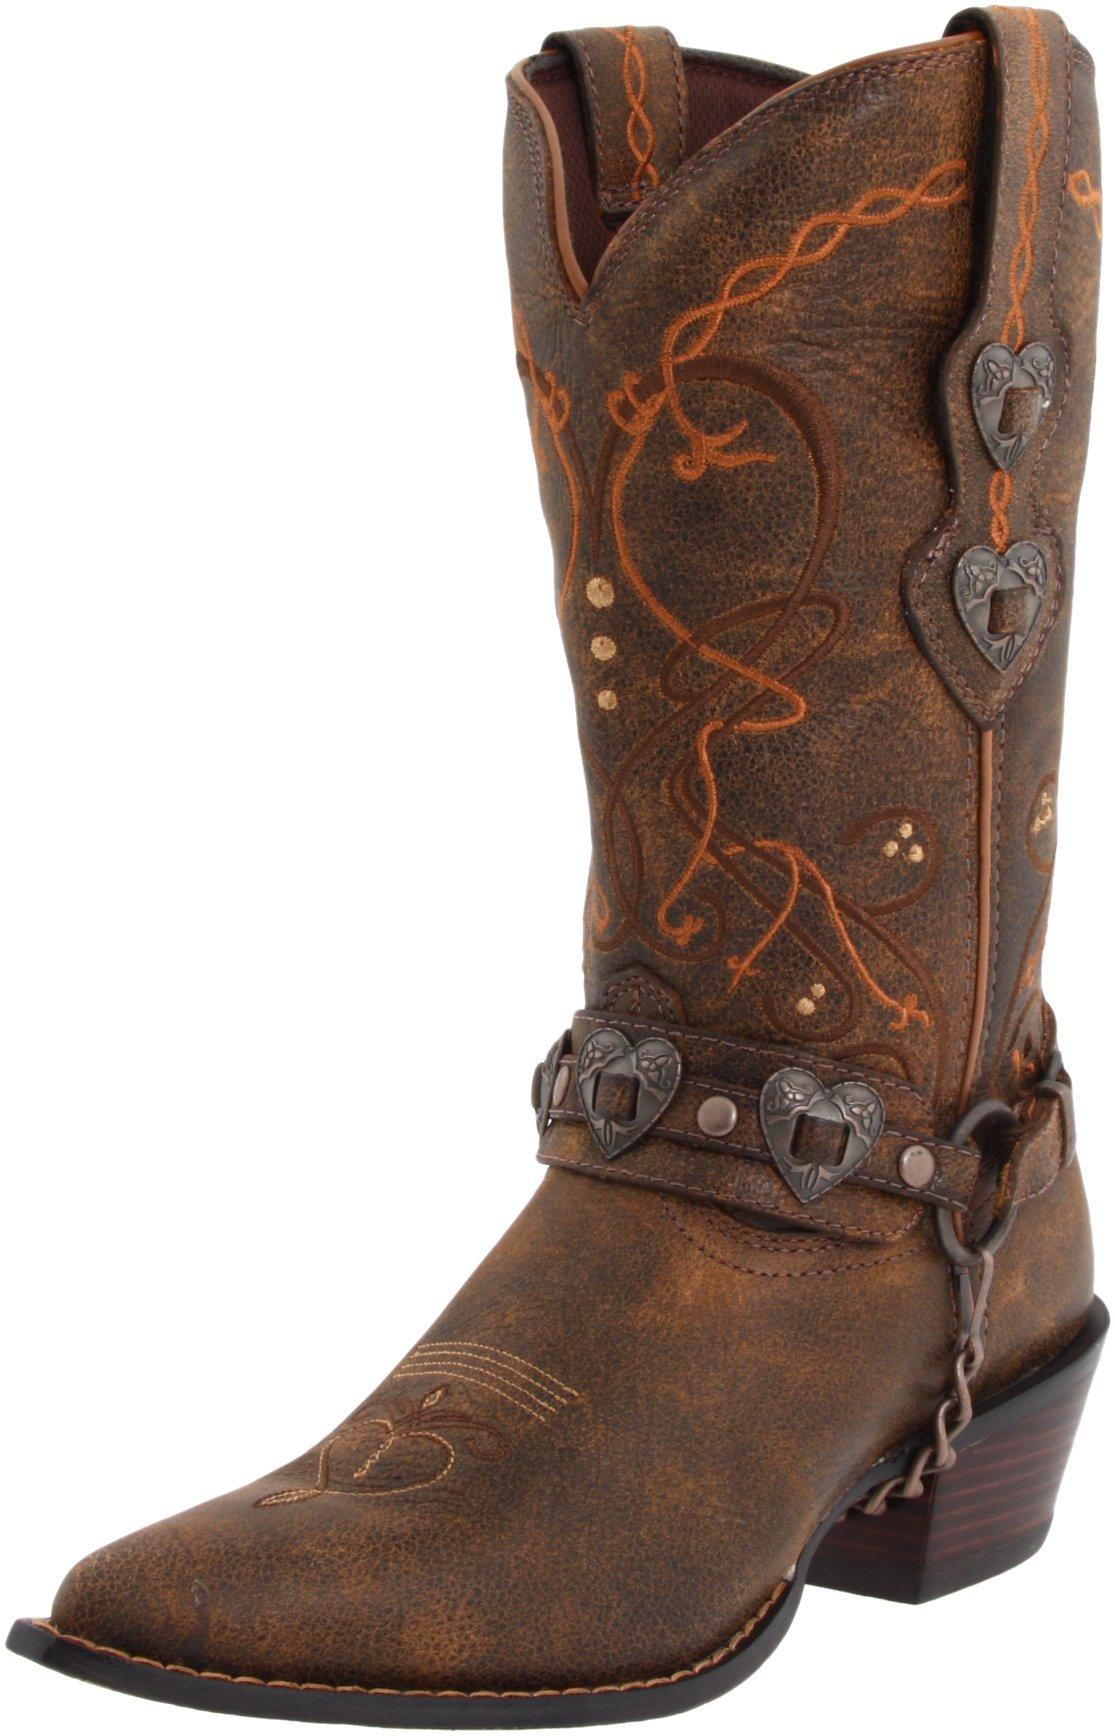 Durango Women's Crush Cowgirl Boot Saddle Brown W/Tan & Brown Boot 7 B - Medium